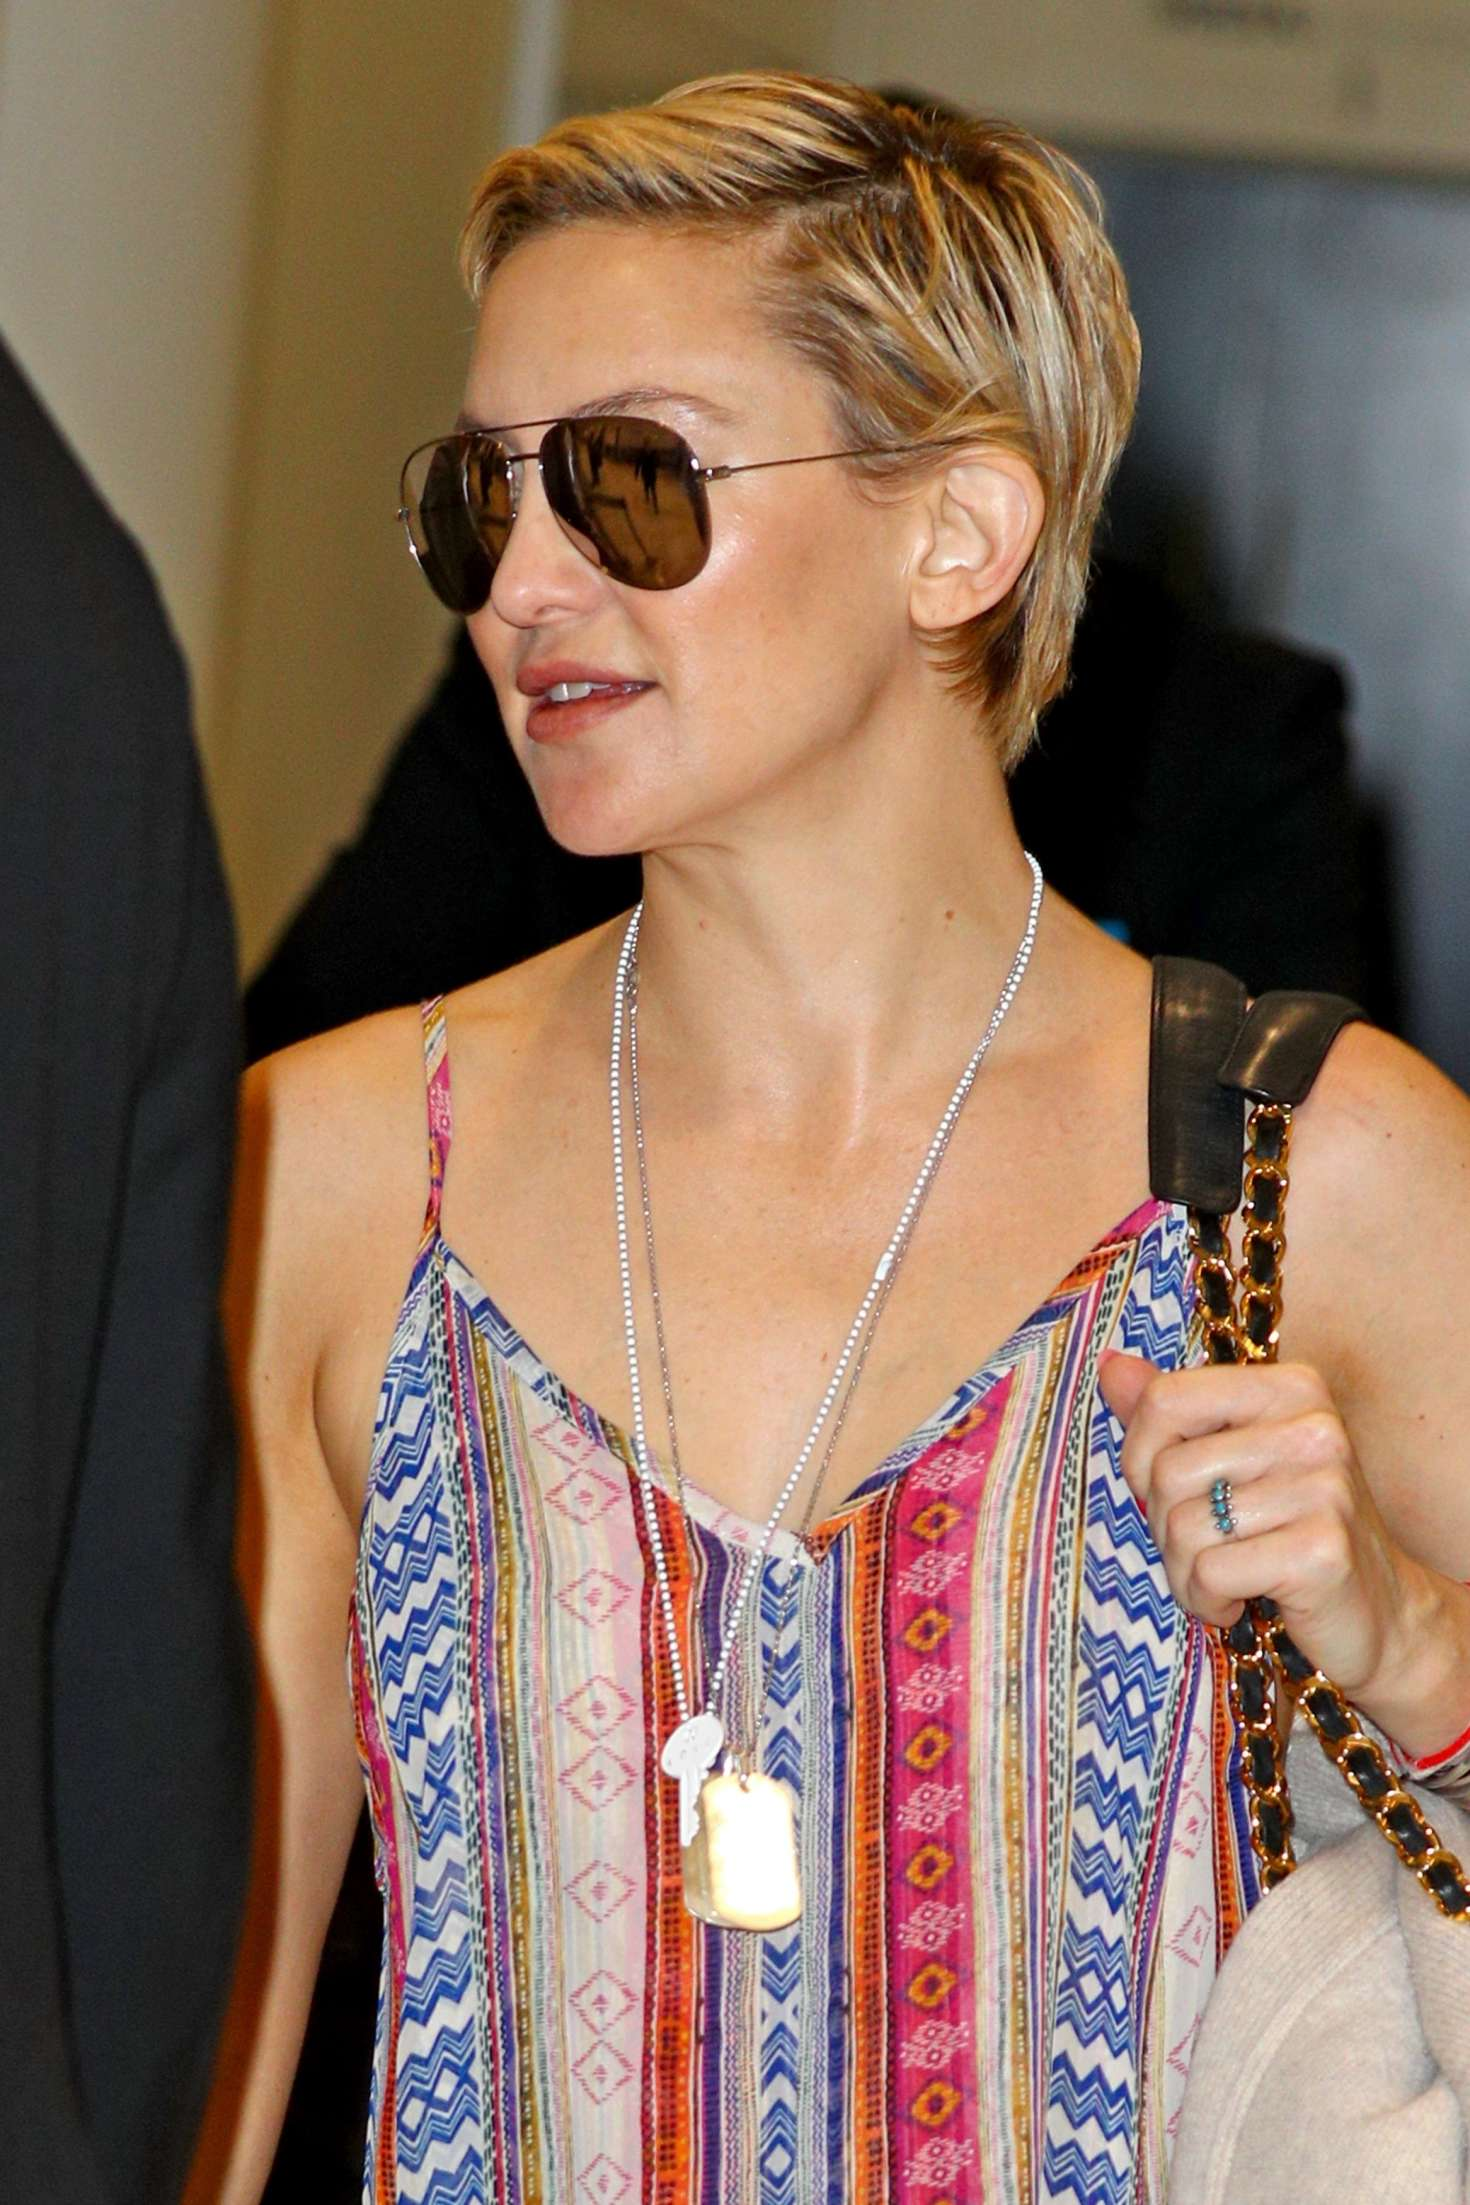 Kate Hudson - Arriving at the Sydney Airport in Australia Jennifer Lawrence